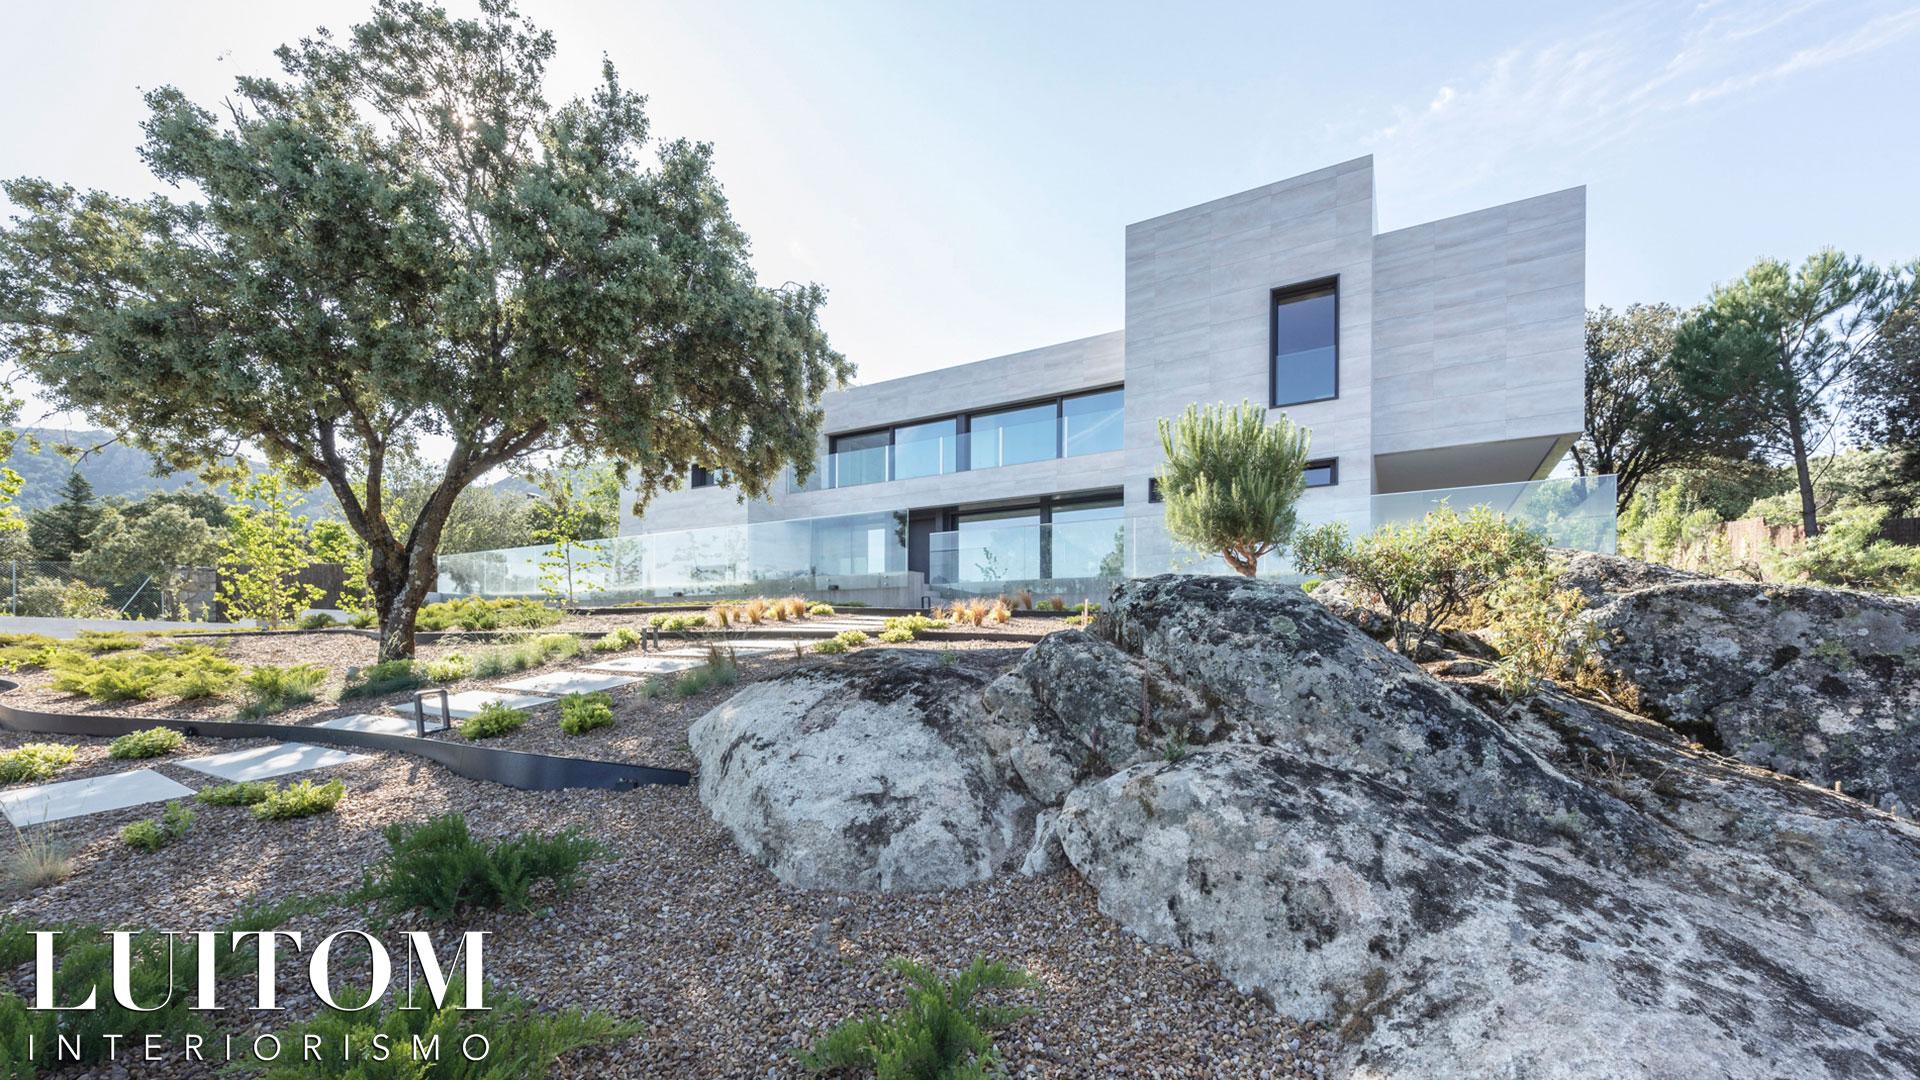 casas-modernas-lujo-villas-arquitectos-madrid-singular-modern-home-project-architect-proyecto-arquitectura-10